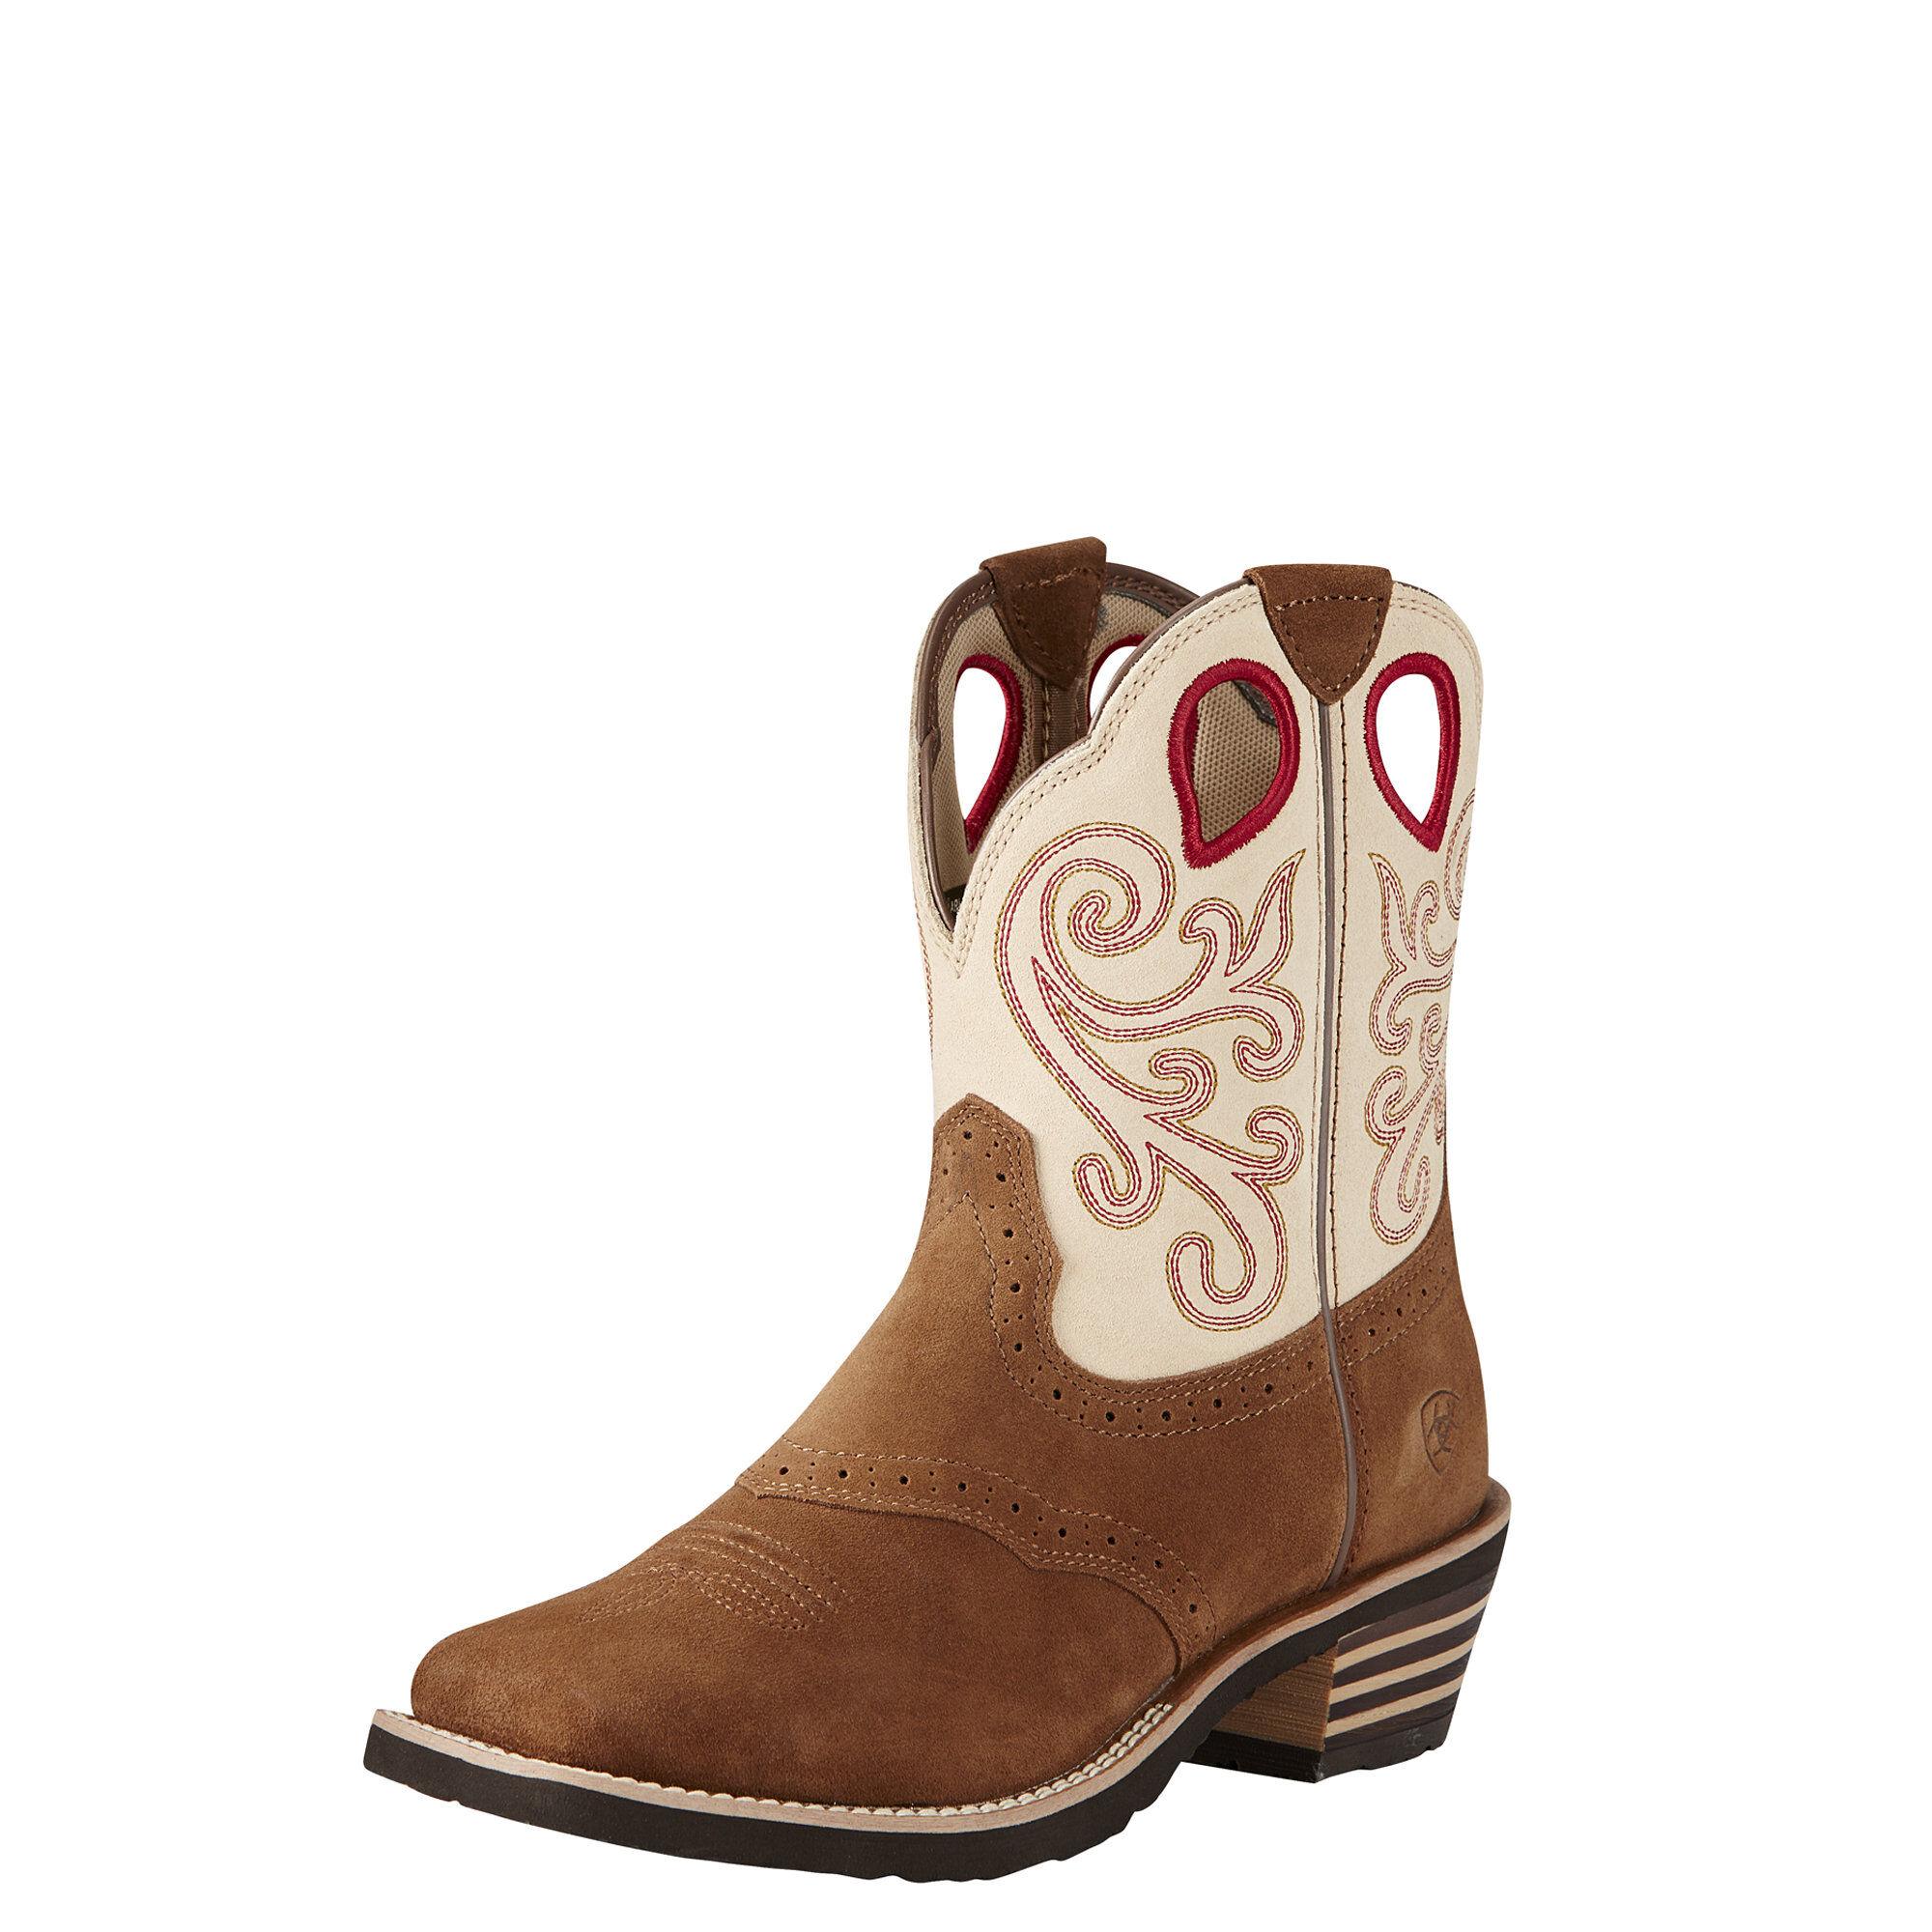 Riata Western Boot